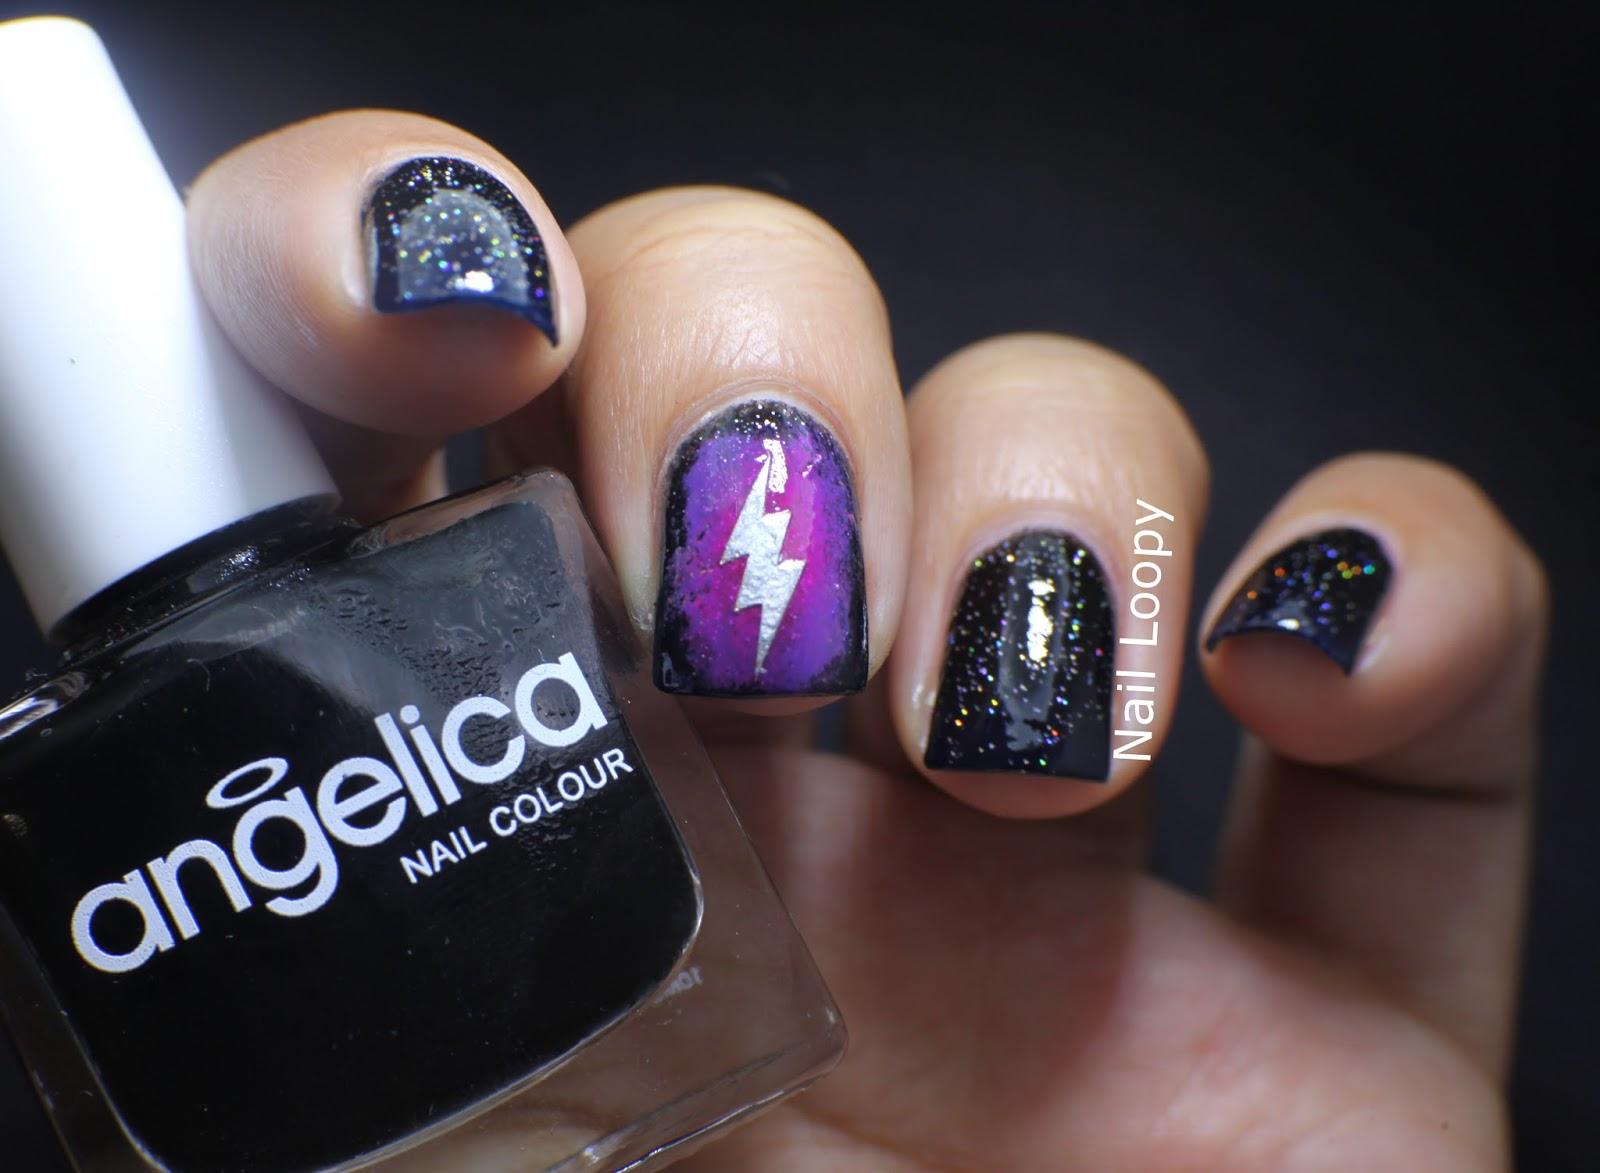 My Blog Verwandt Mit Lightning: Nail Loopy: LIGHTNING NAILS